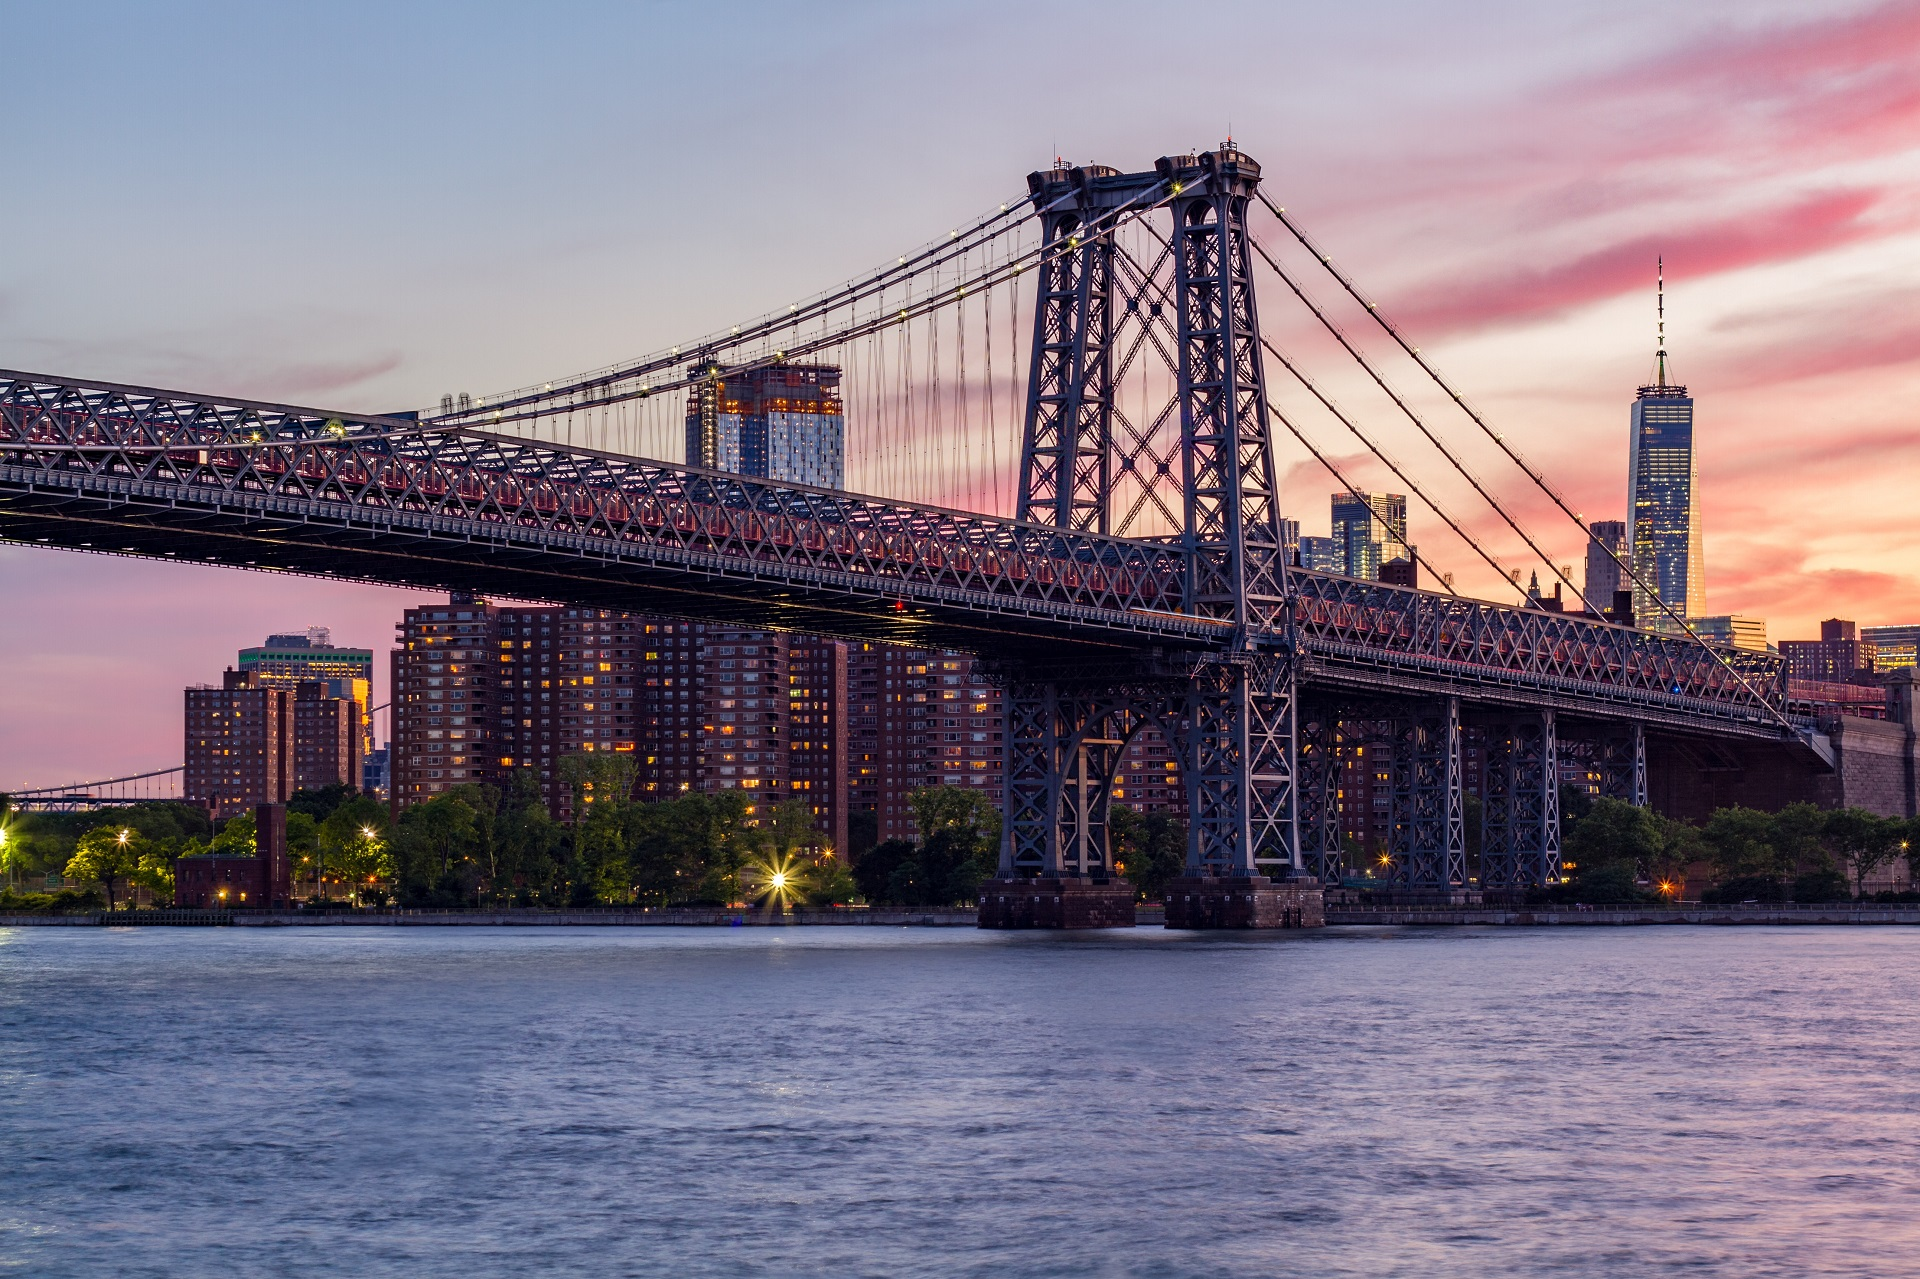 City Bridge Architecture Williamsburg Bridge New York City USA Water Cityscape Construction 1920x1279